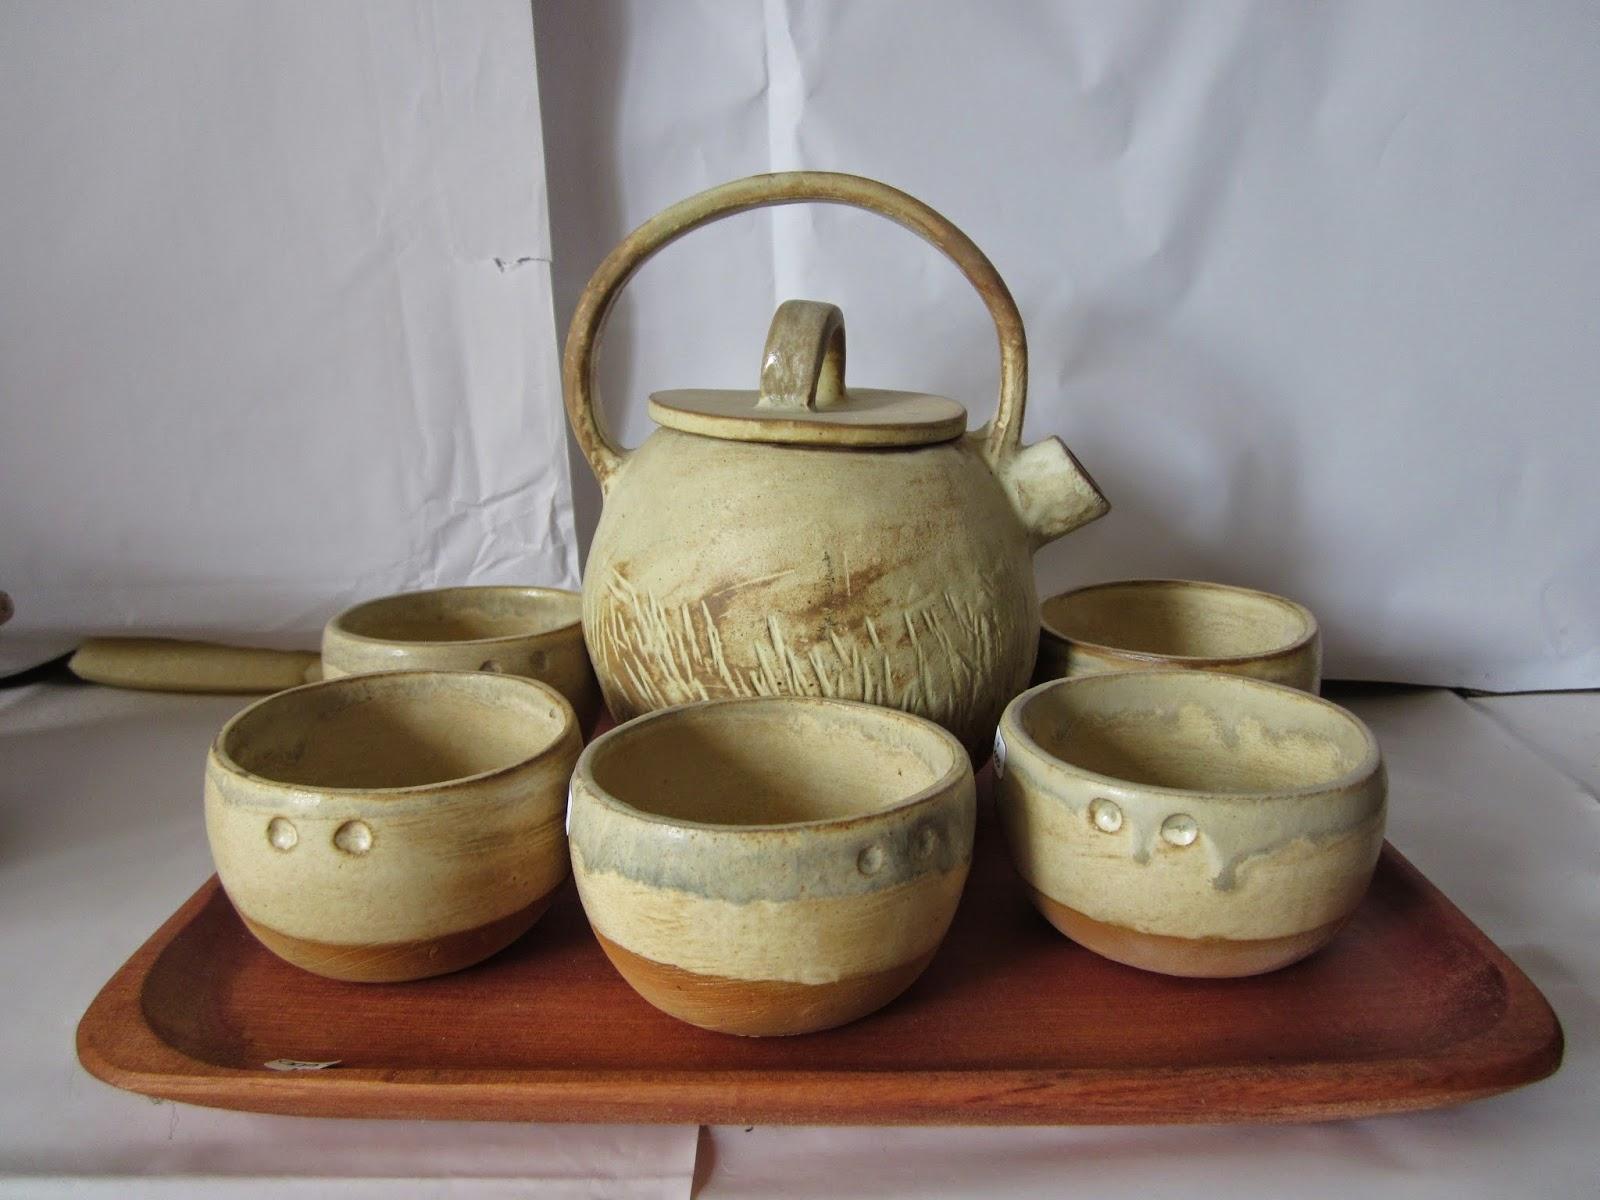 Cer mica gres tetera en cer mica gresclases de cer mica for Pasta para ceramica gres